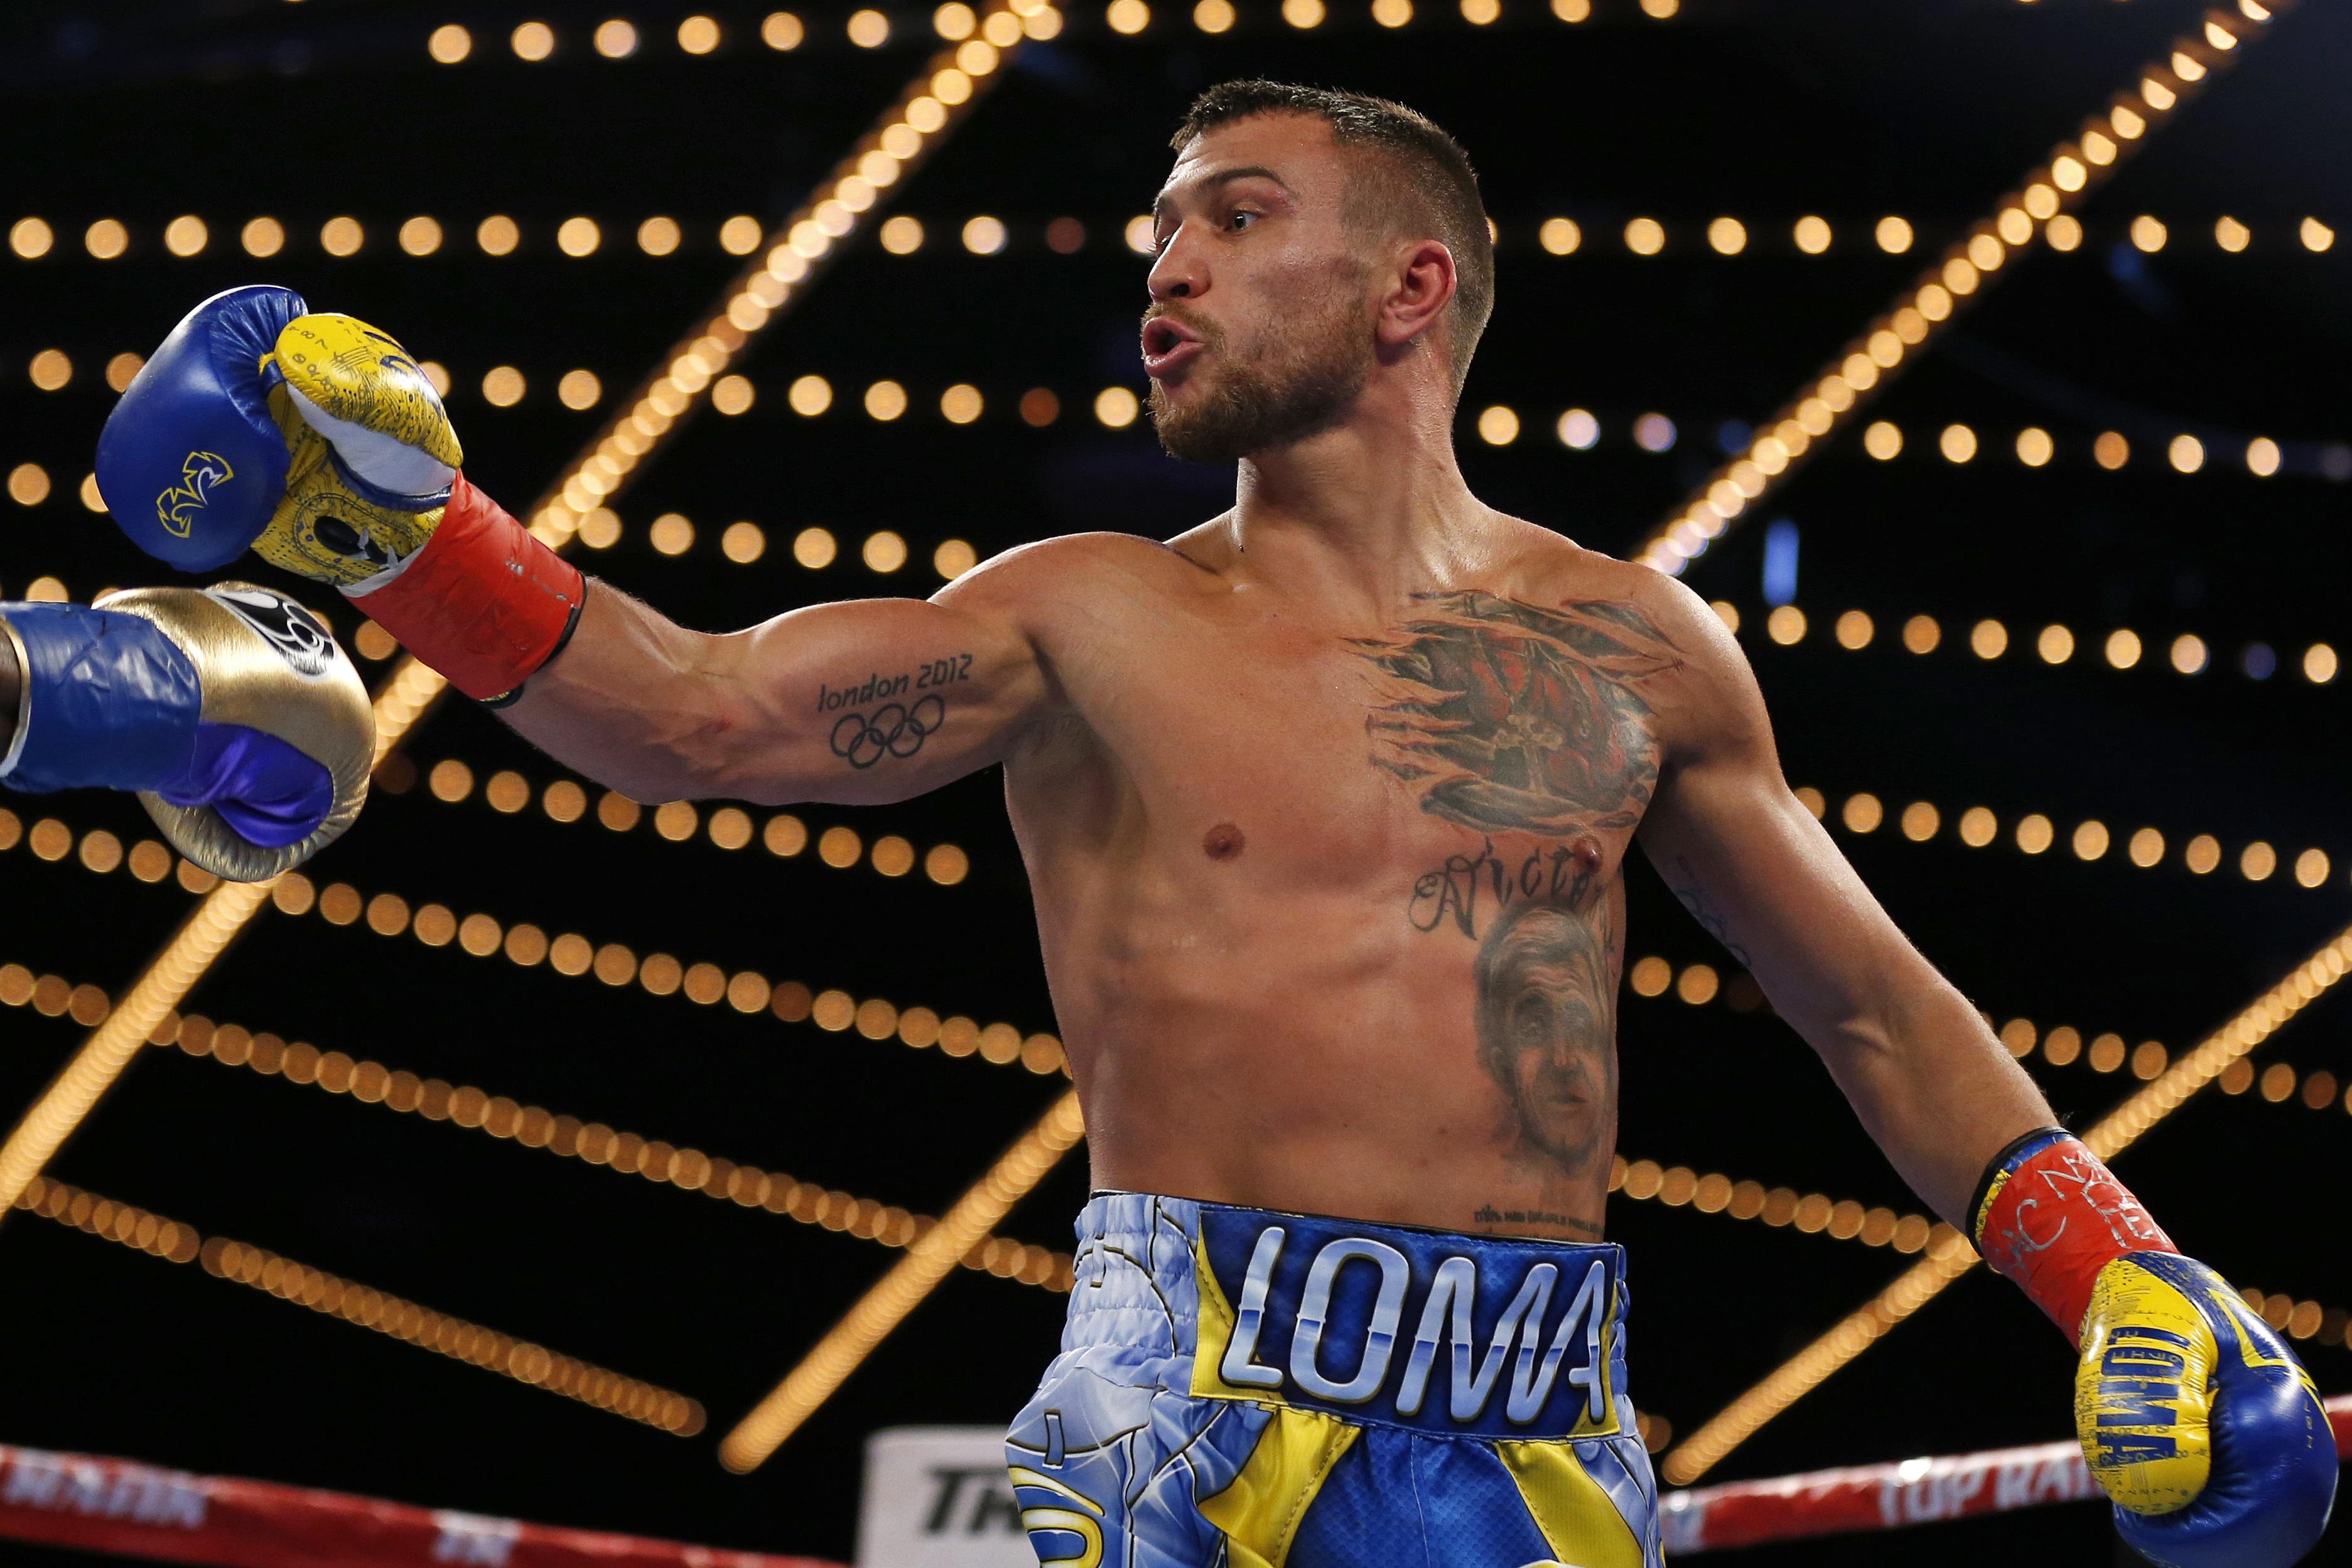 Teofimo nombra a sus rivales, Lomachenko se burla de él   Deportes Boxeo    TUDN Univision